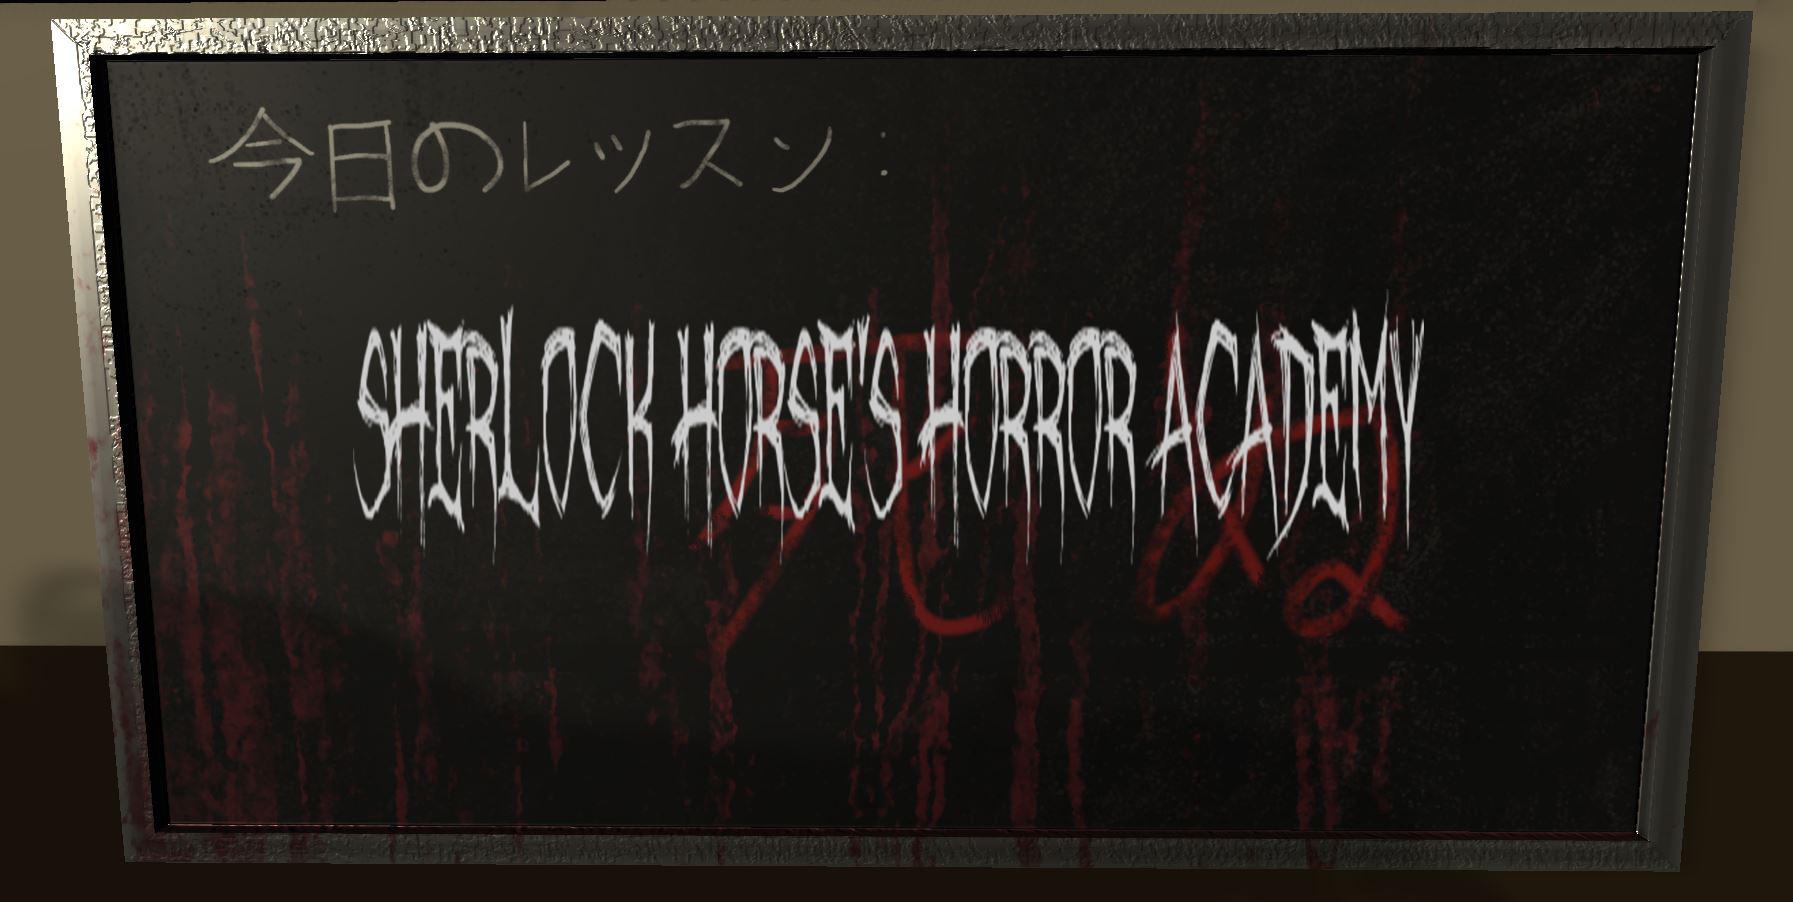 Sherlock Horse's Horror Academy